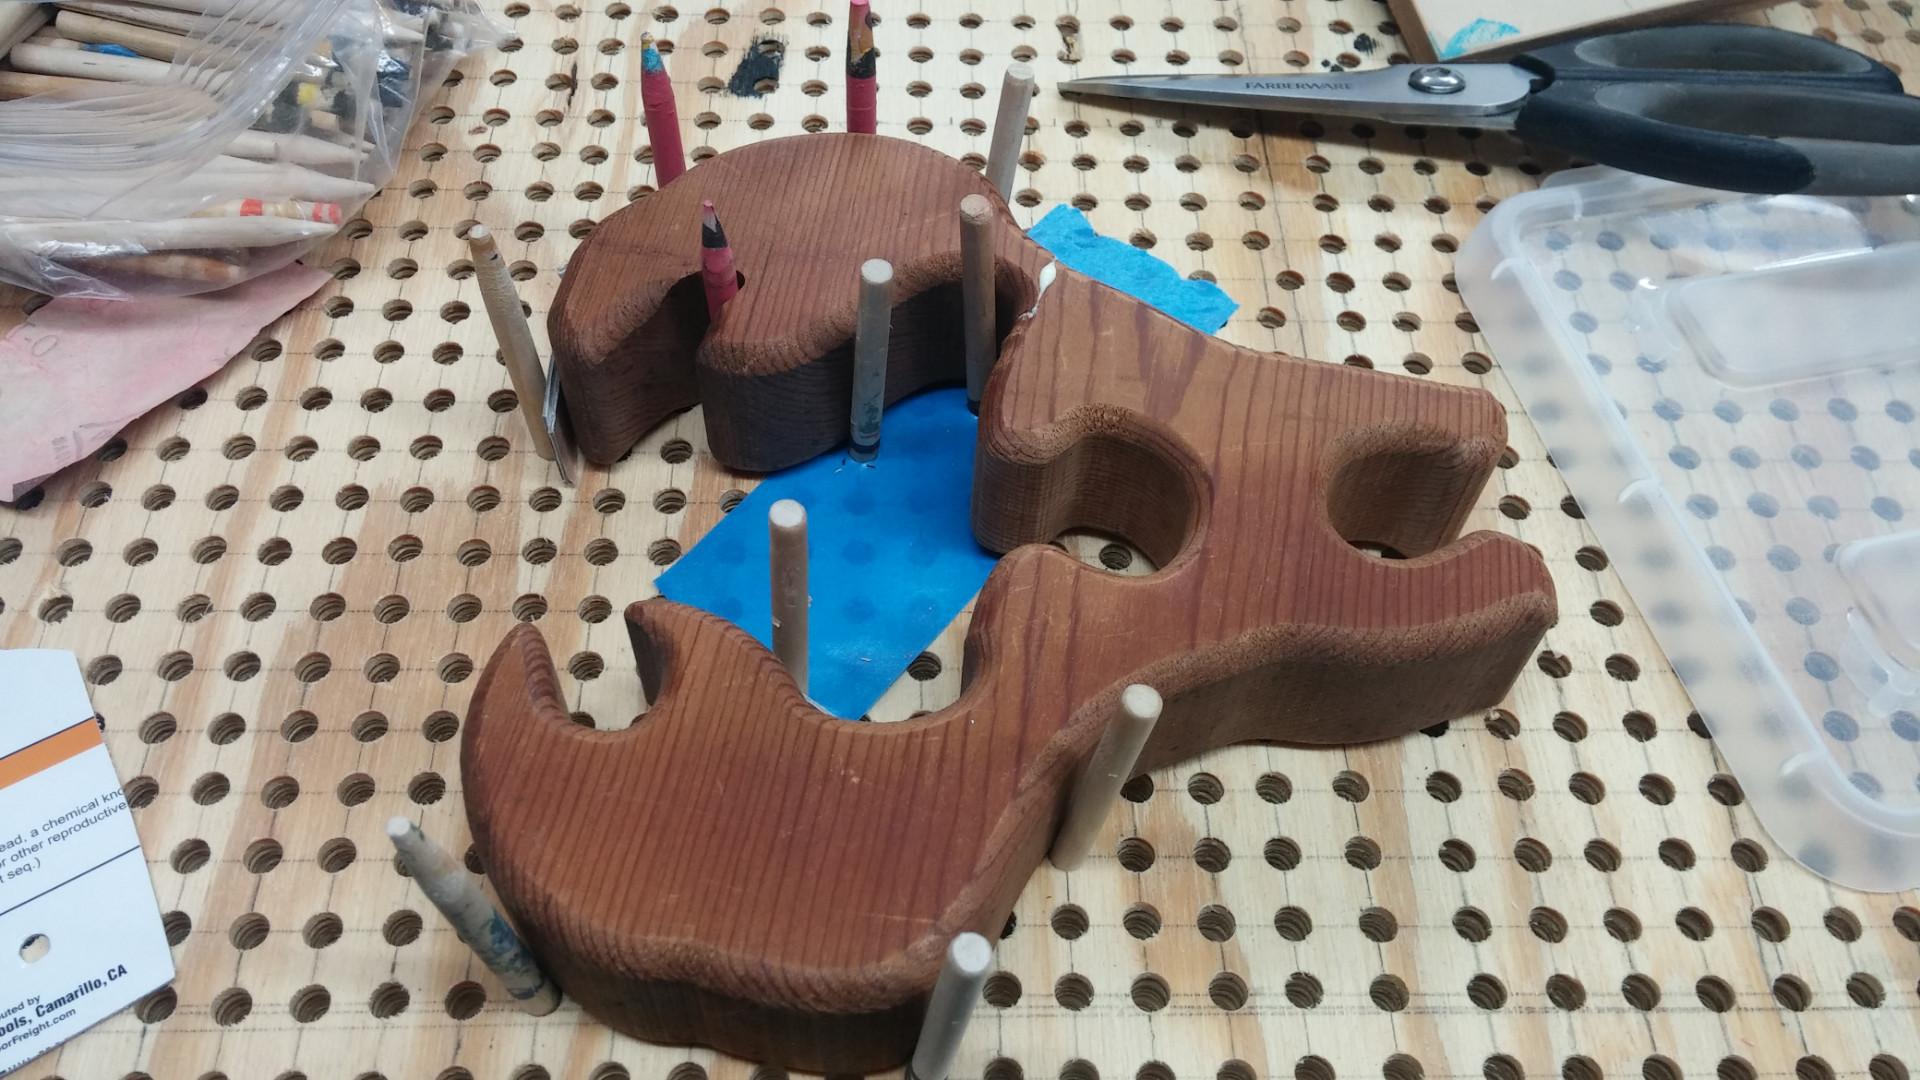 2016-03-28 192542 Toy Makers Shop Repairing Lobster Puzzle.jpg